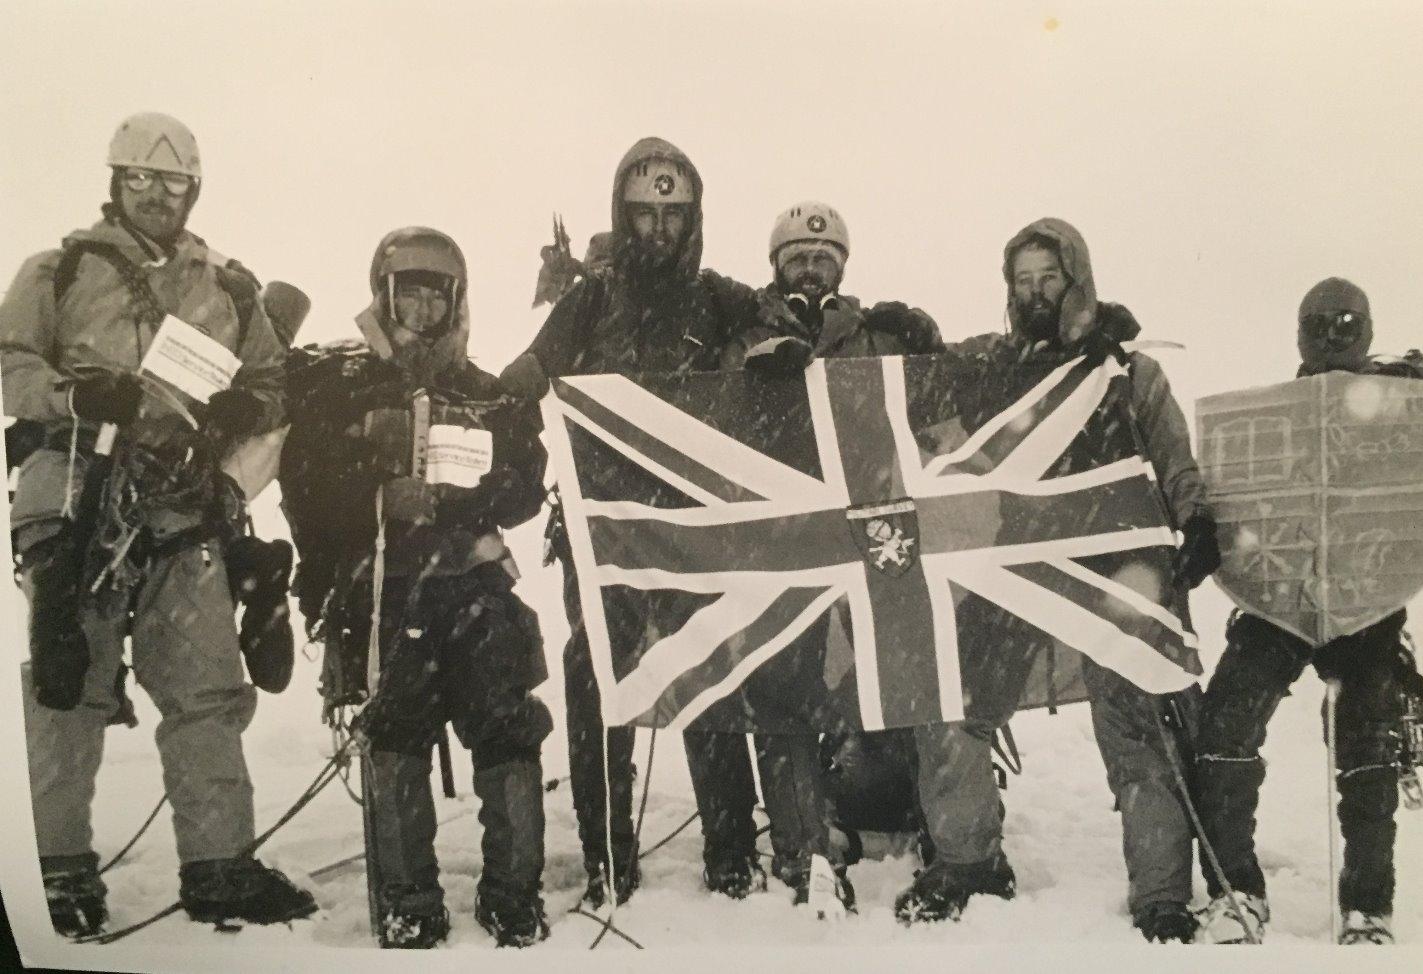 Summit of Chimborazo, Ecuador